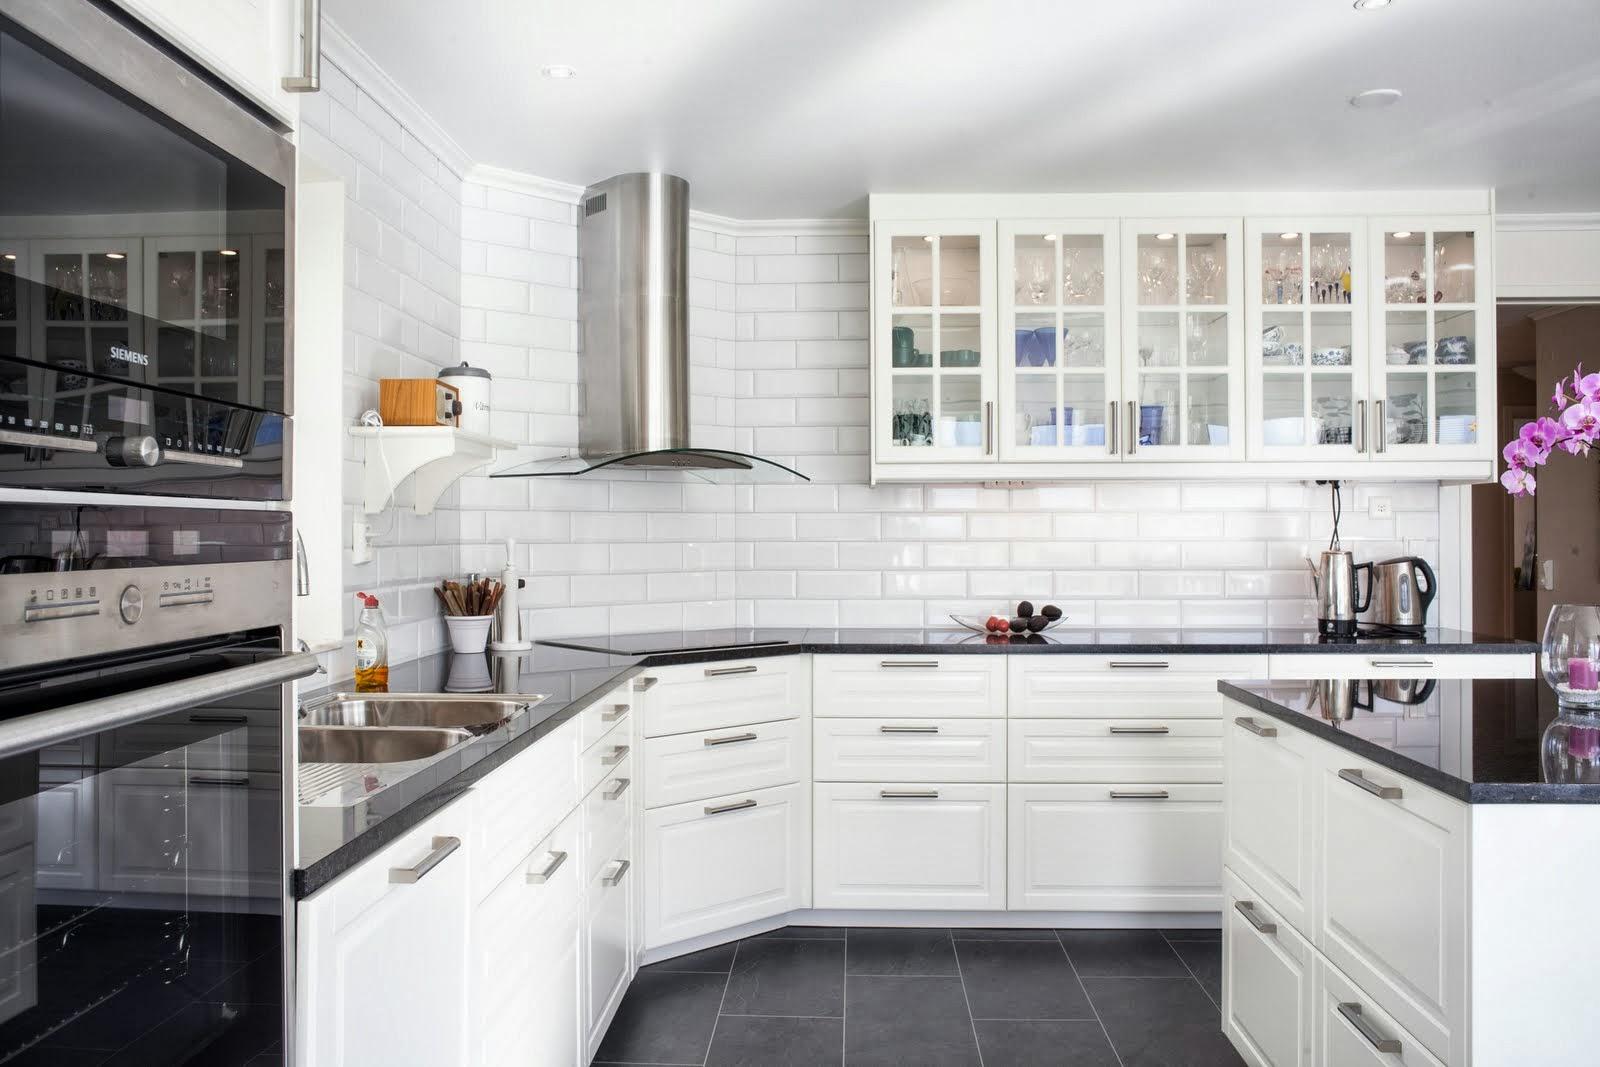 Img 1600 1067 cucina pinterest - Cucina 1000 euro ...